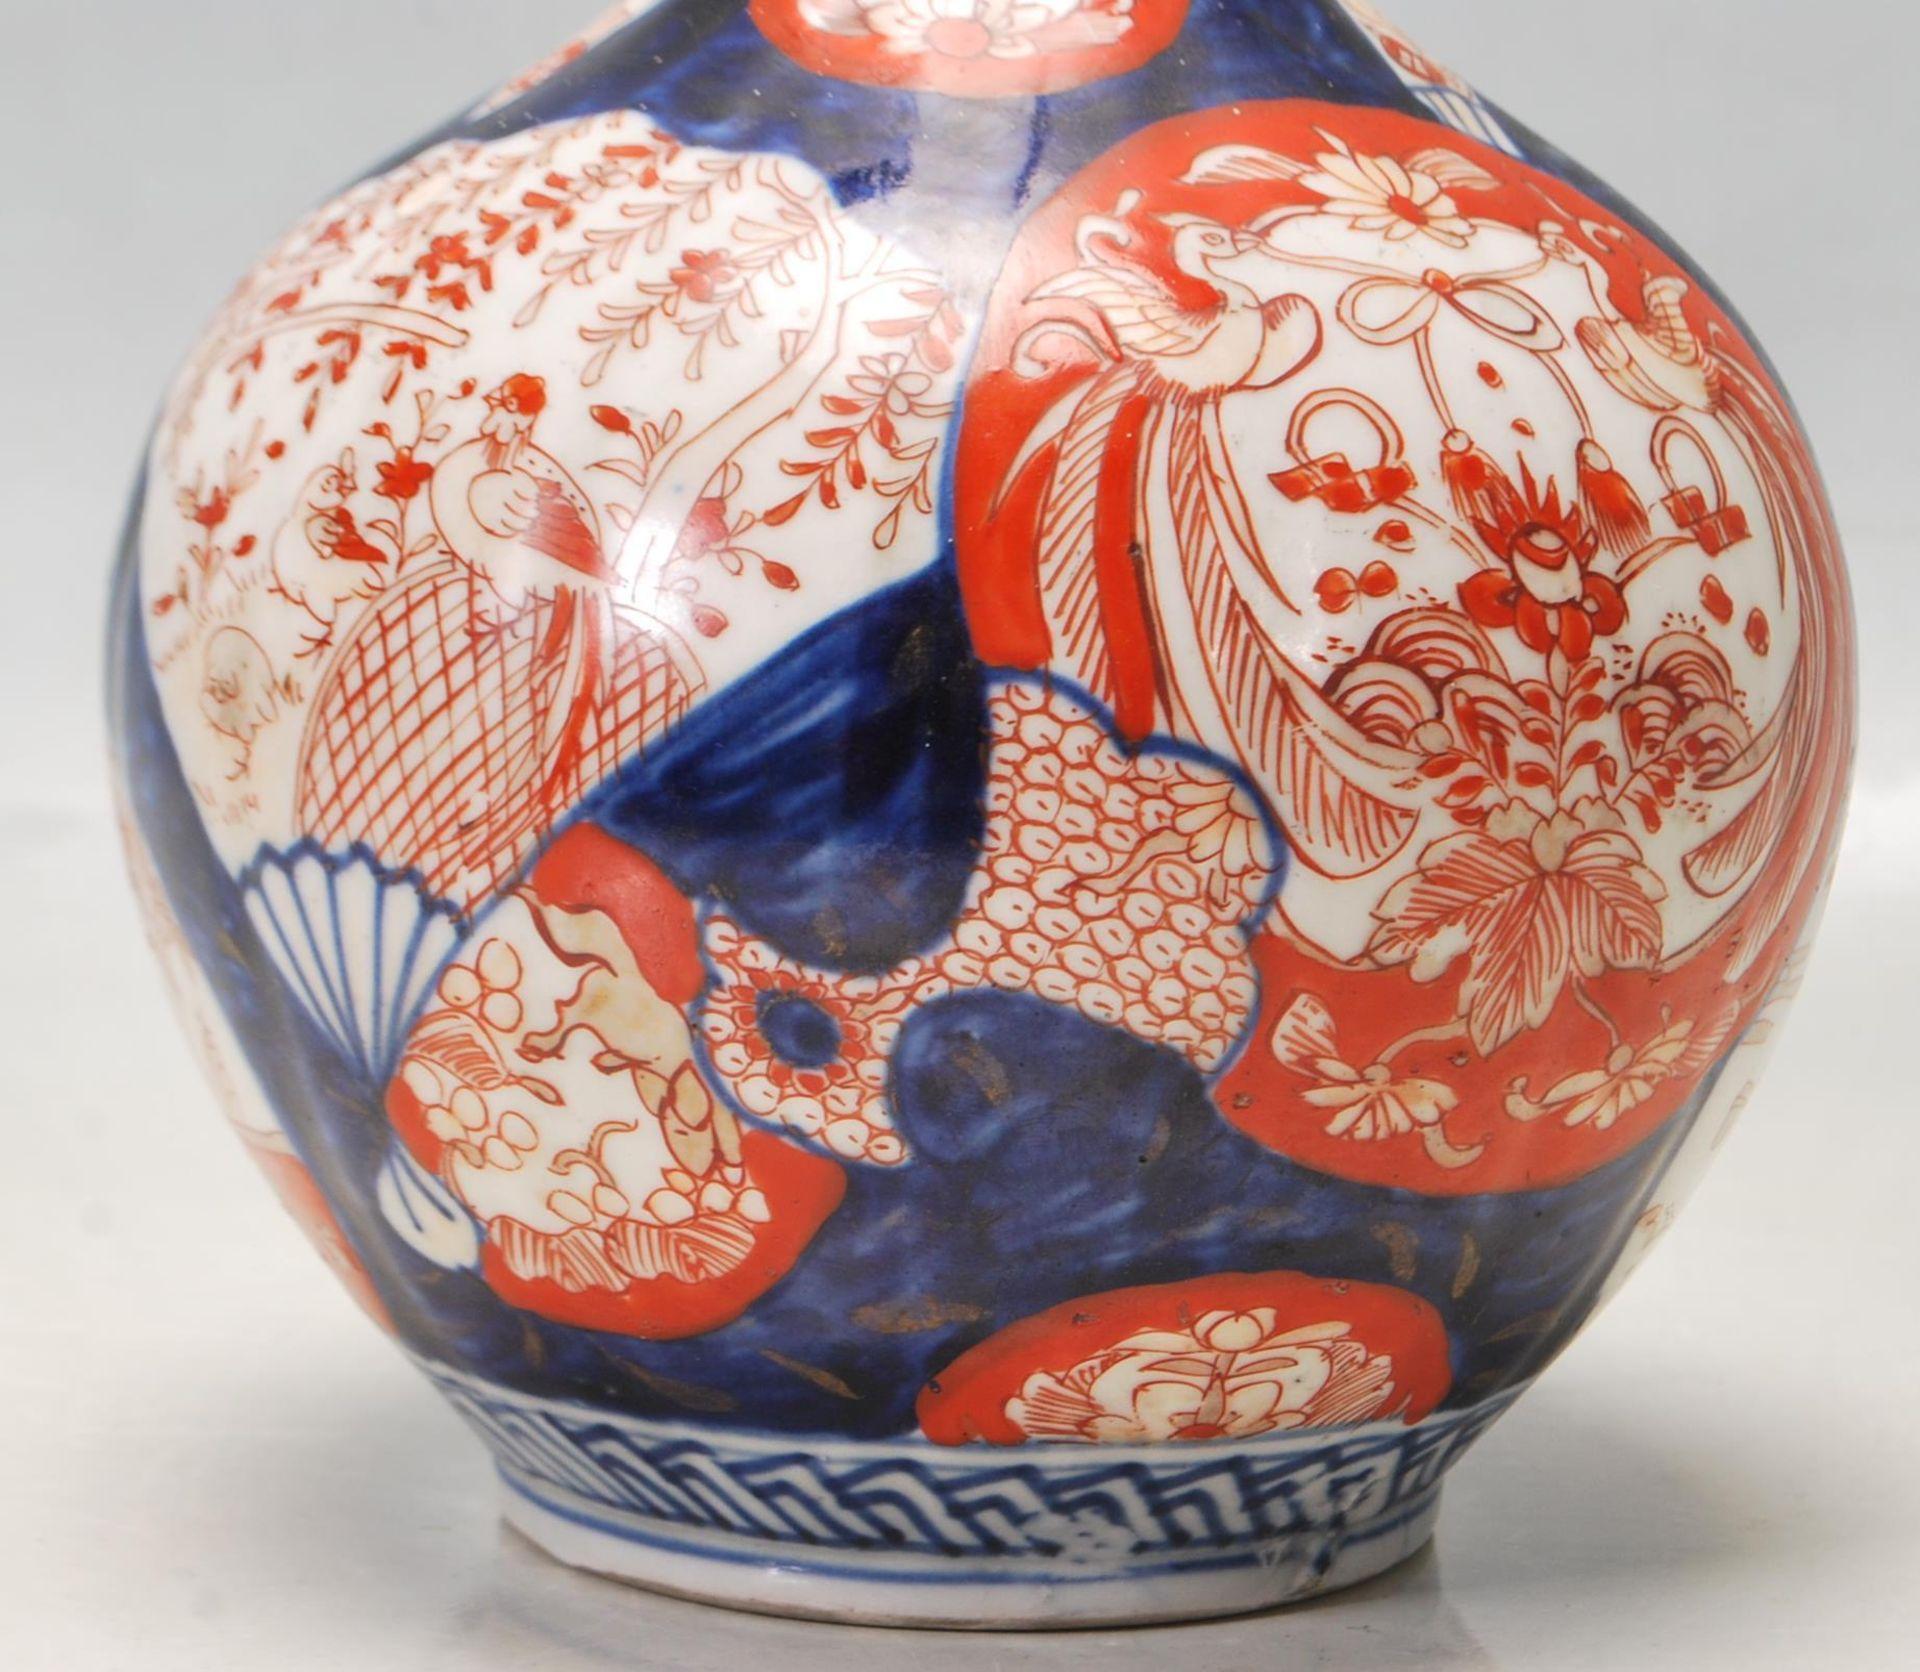 19TH CENTURY CHINESE IMARI PATTERN STEM VASE - Image 4 of 8